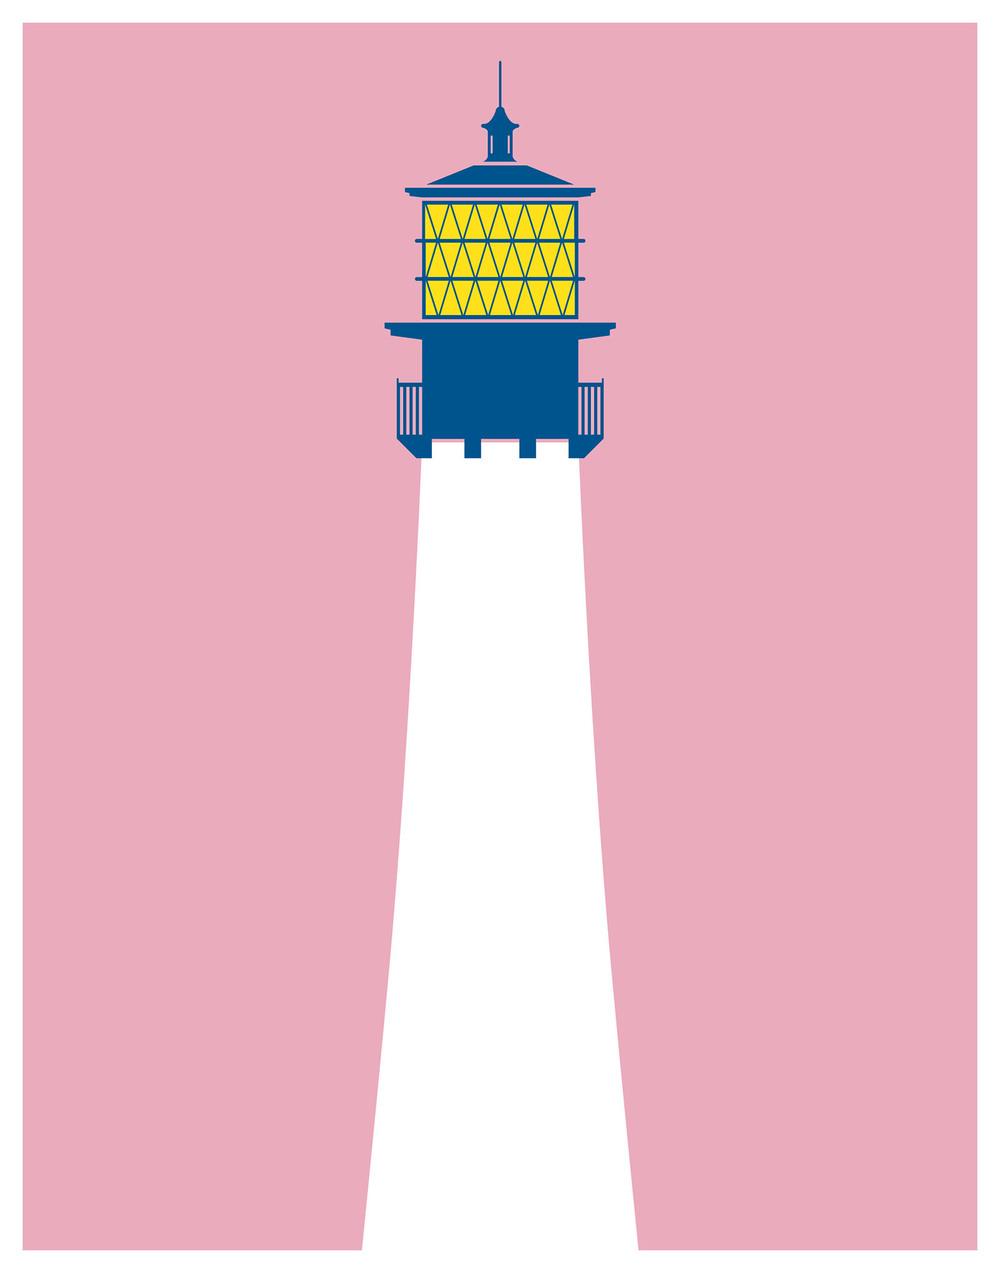 Cape Florida Lighthouse_11 x 14.jpg